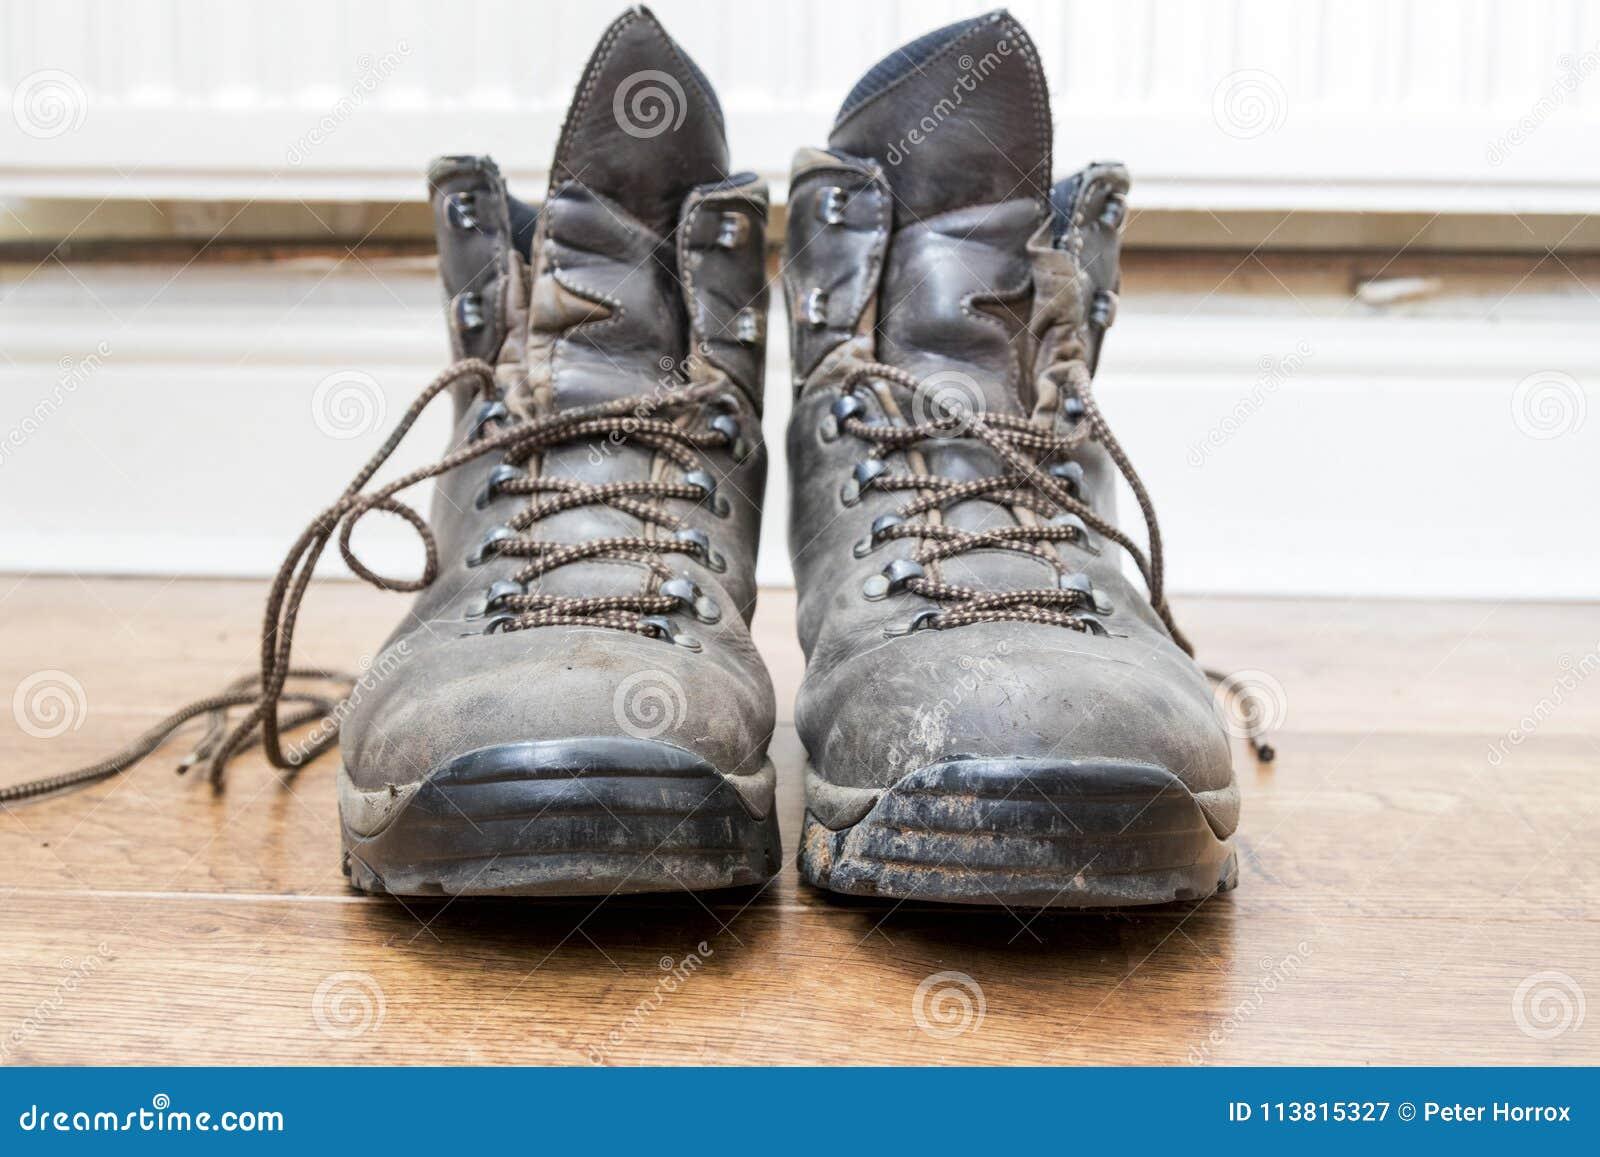 Pair of worn walking boots